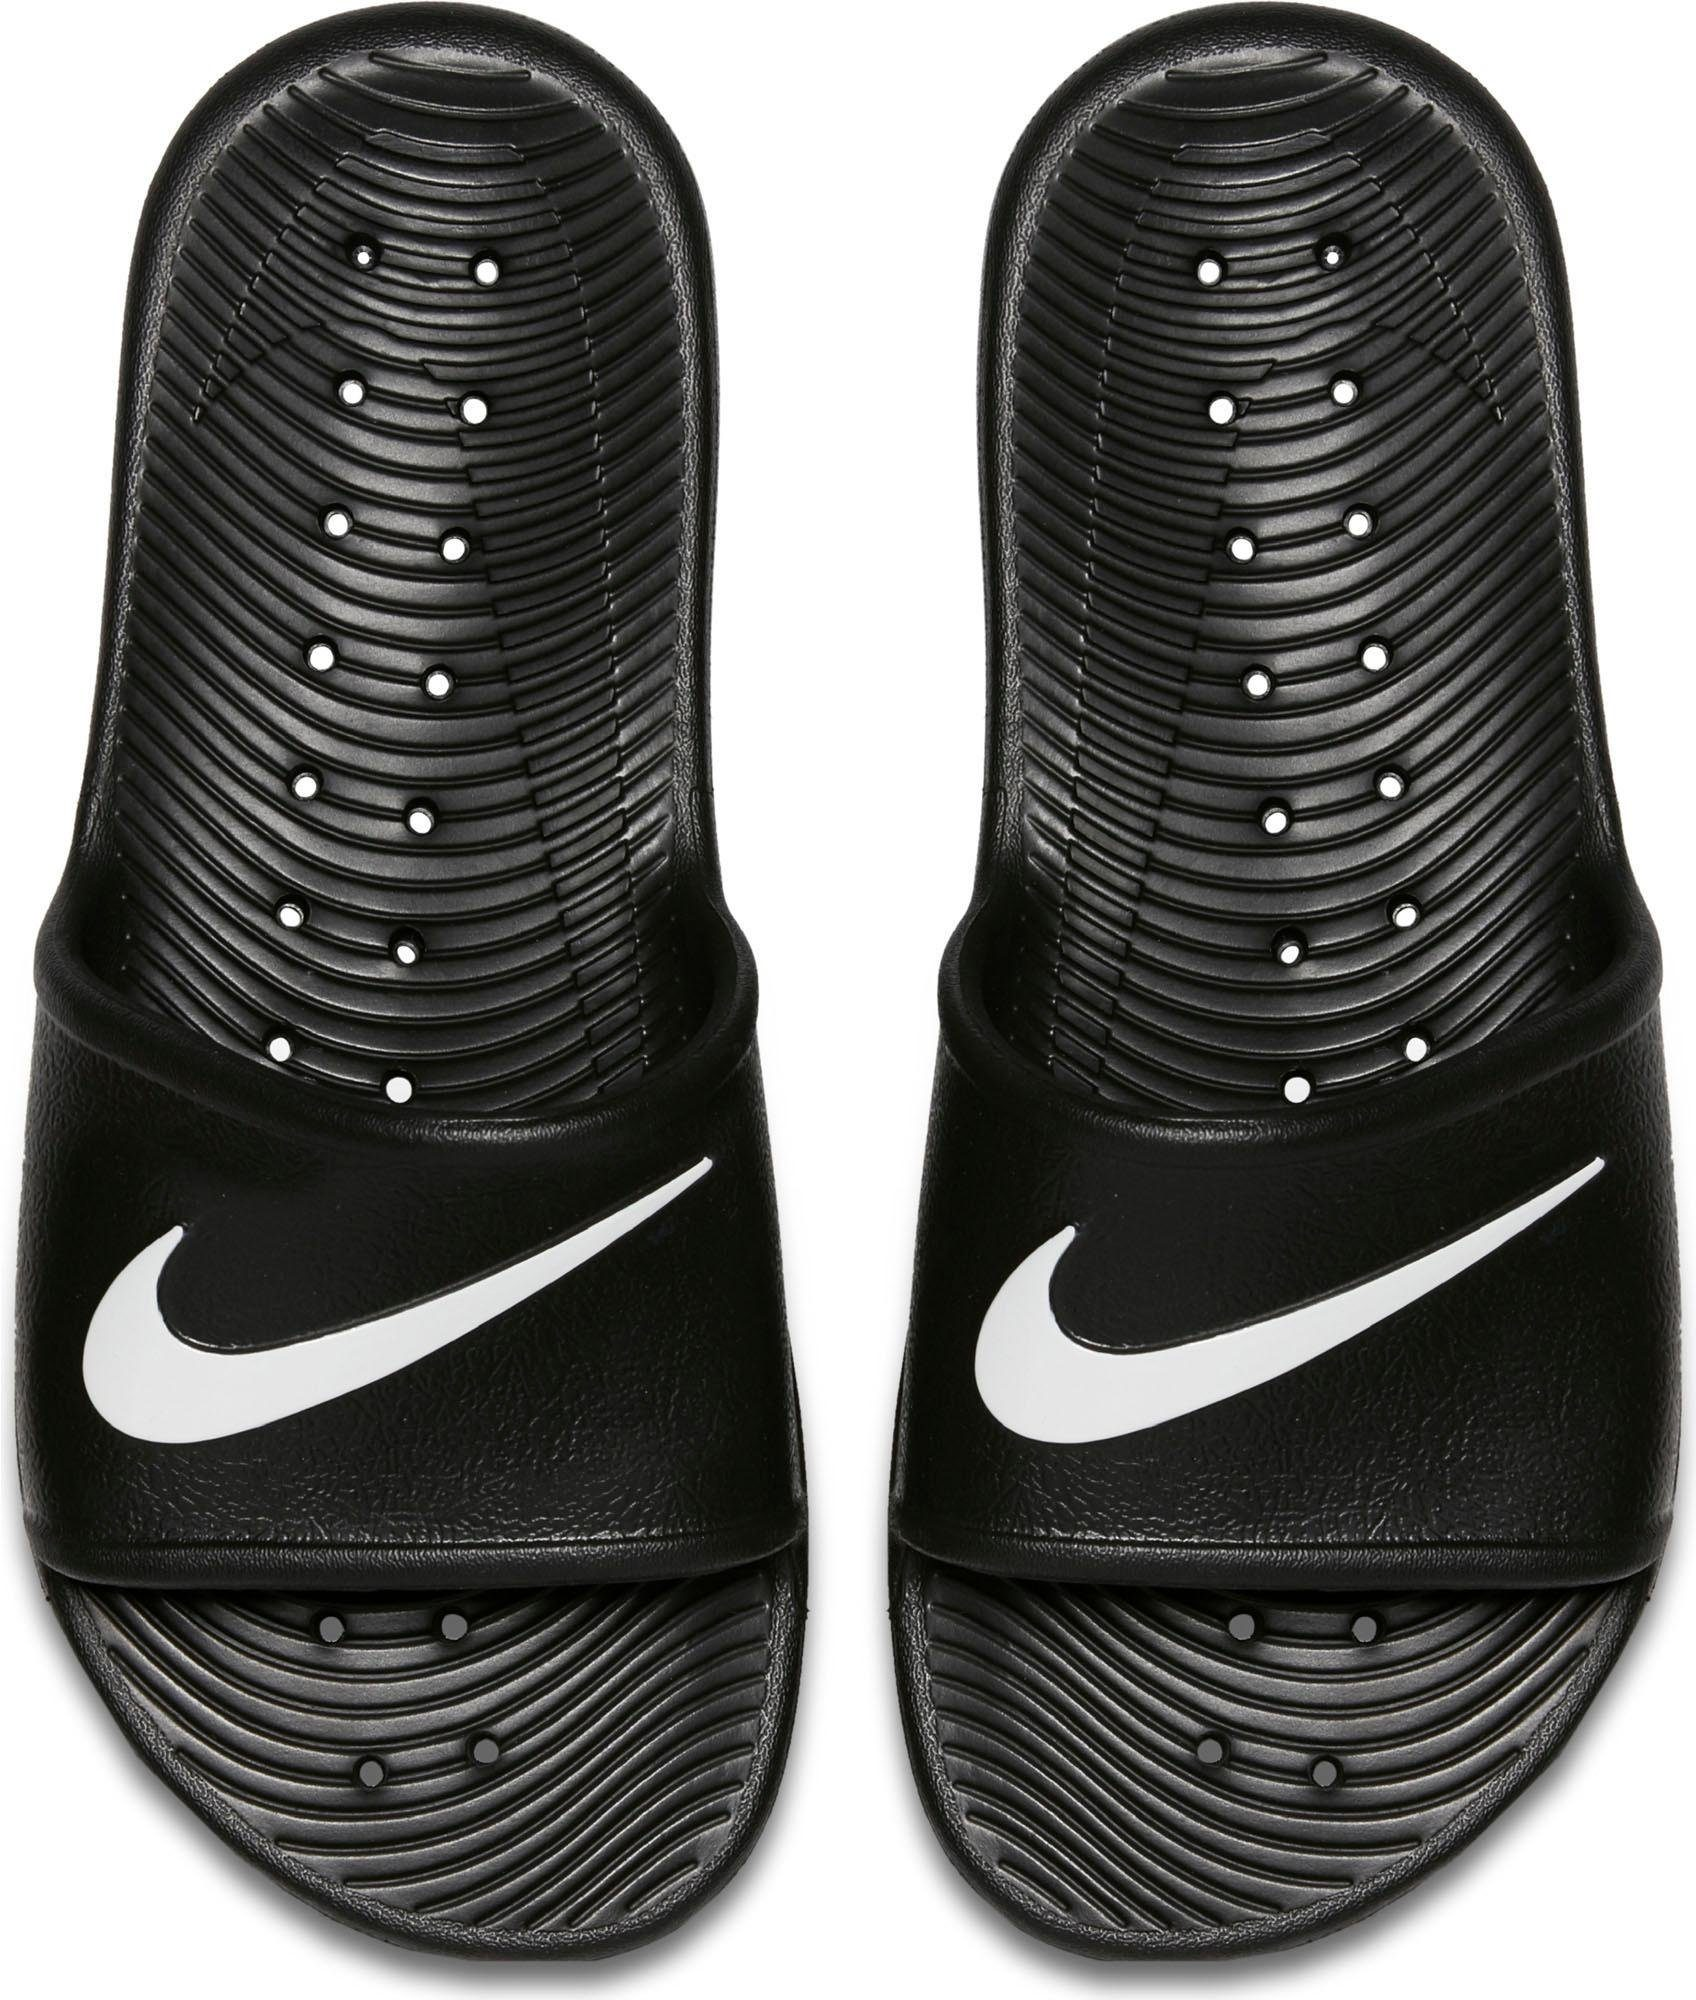 Nike Sportswear »Wmns Kawa Shower Sandal« Badesandale online kaufen | OTTO